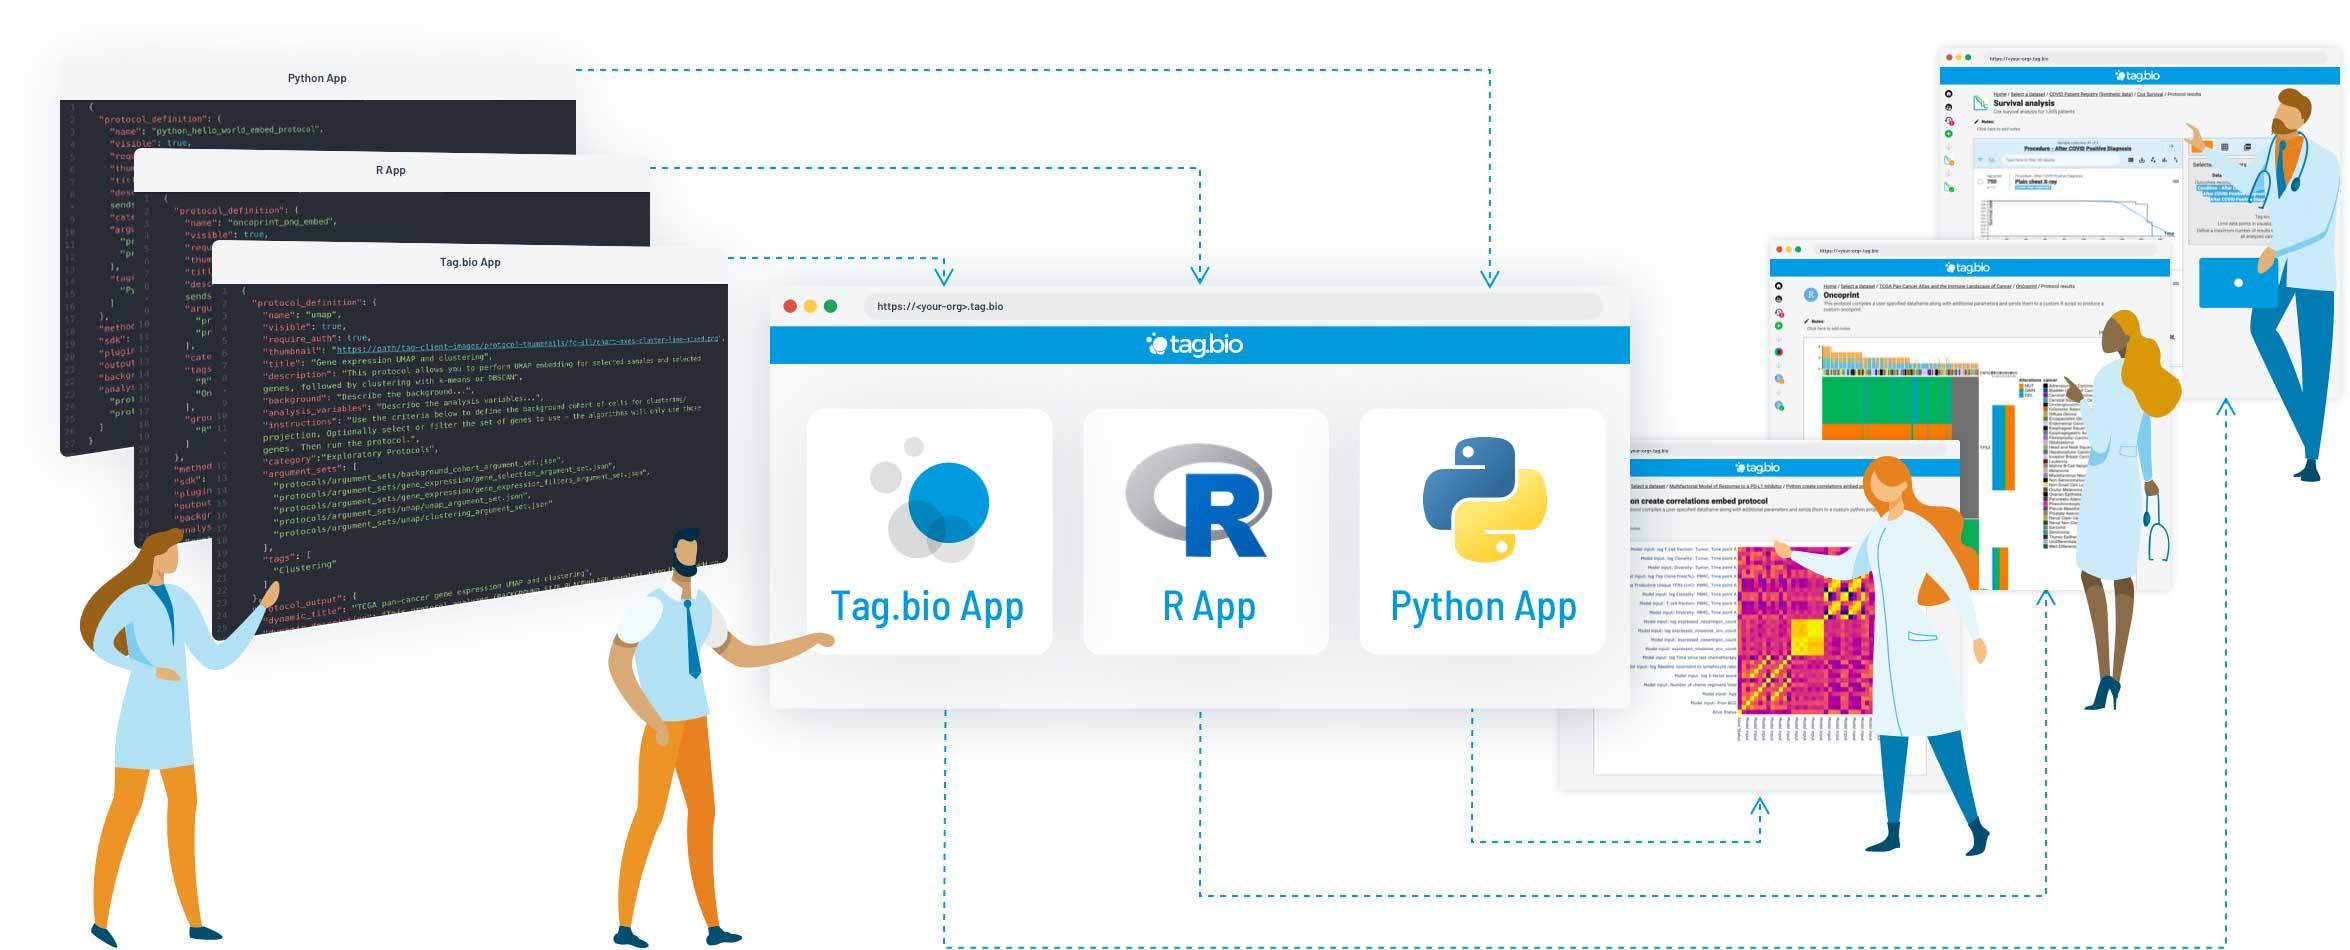 Tag.bio - publish R and Python code